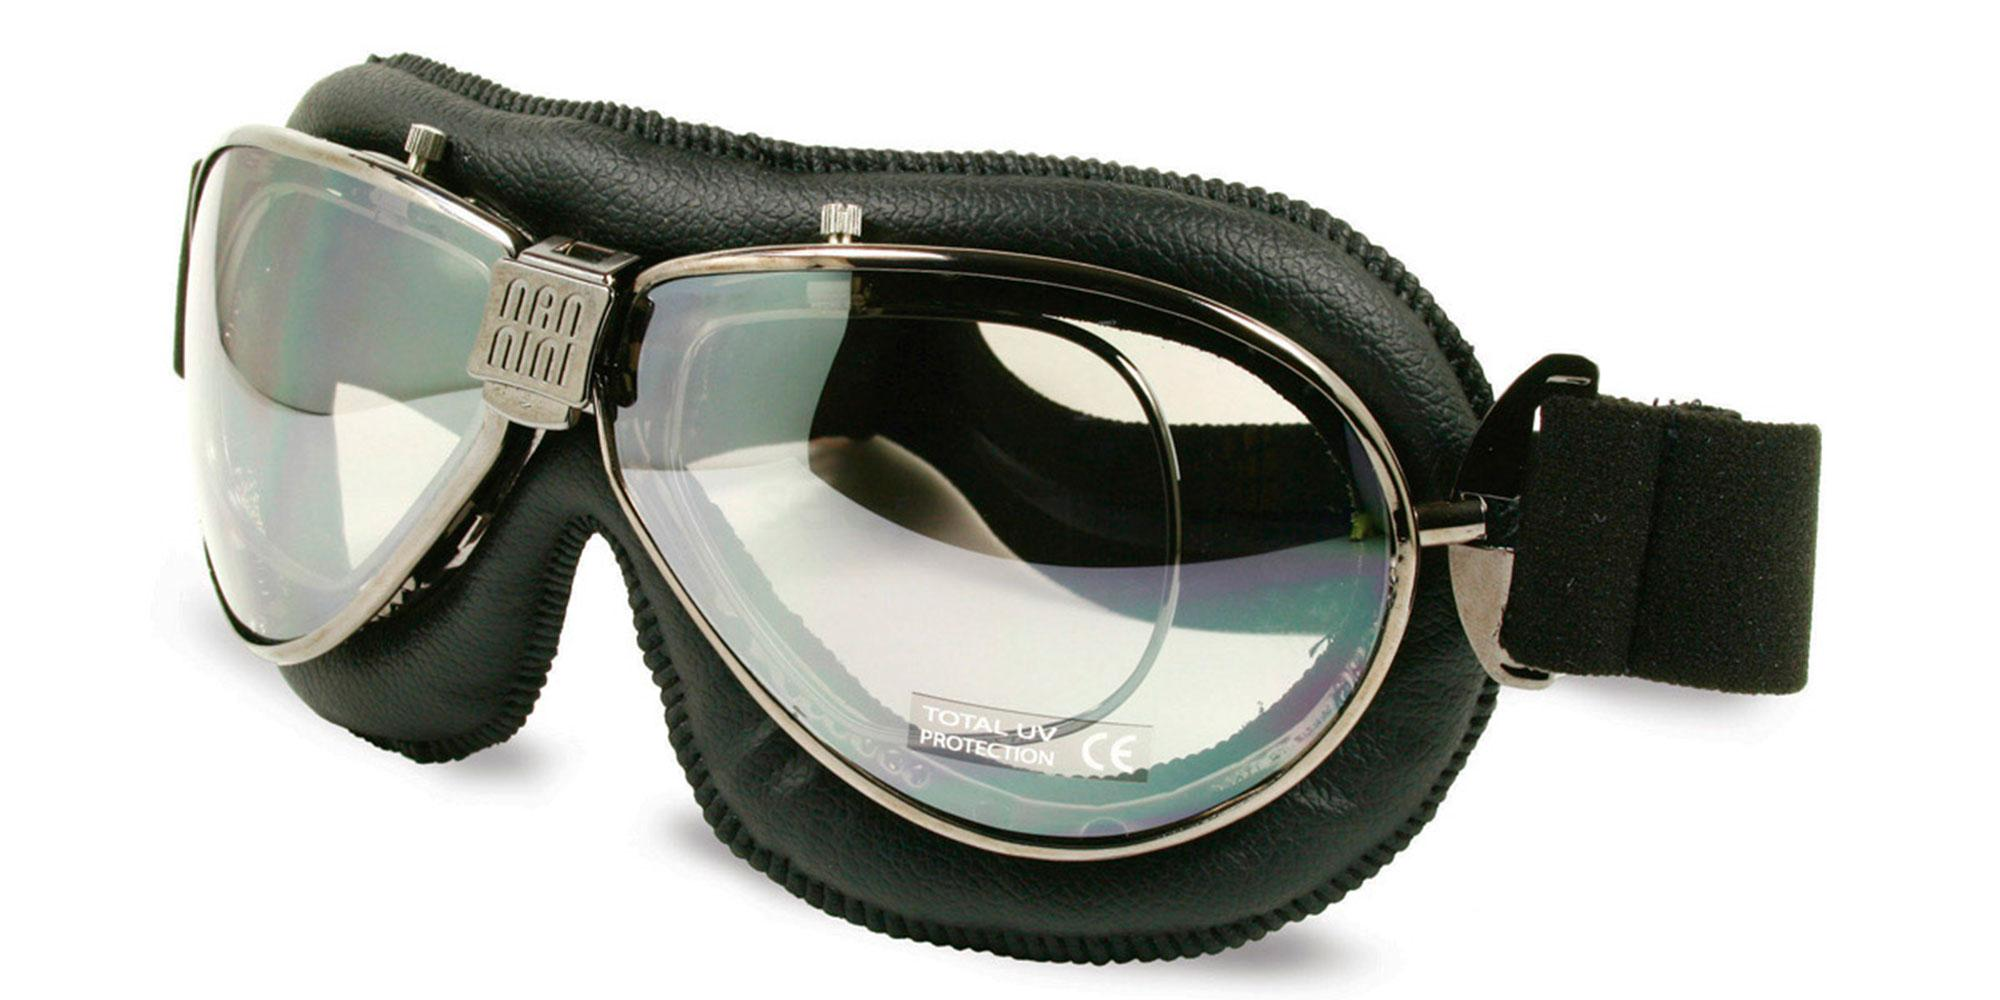 Black/Chrome TT - with prescription insert Goggles, Sports Eyewear